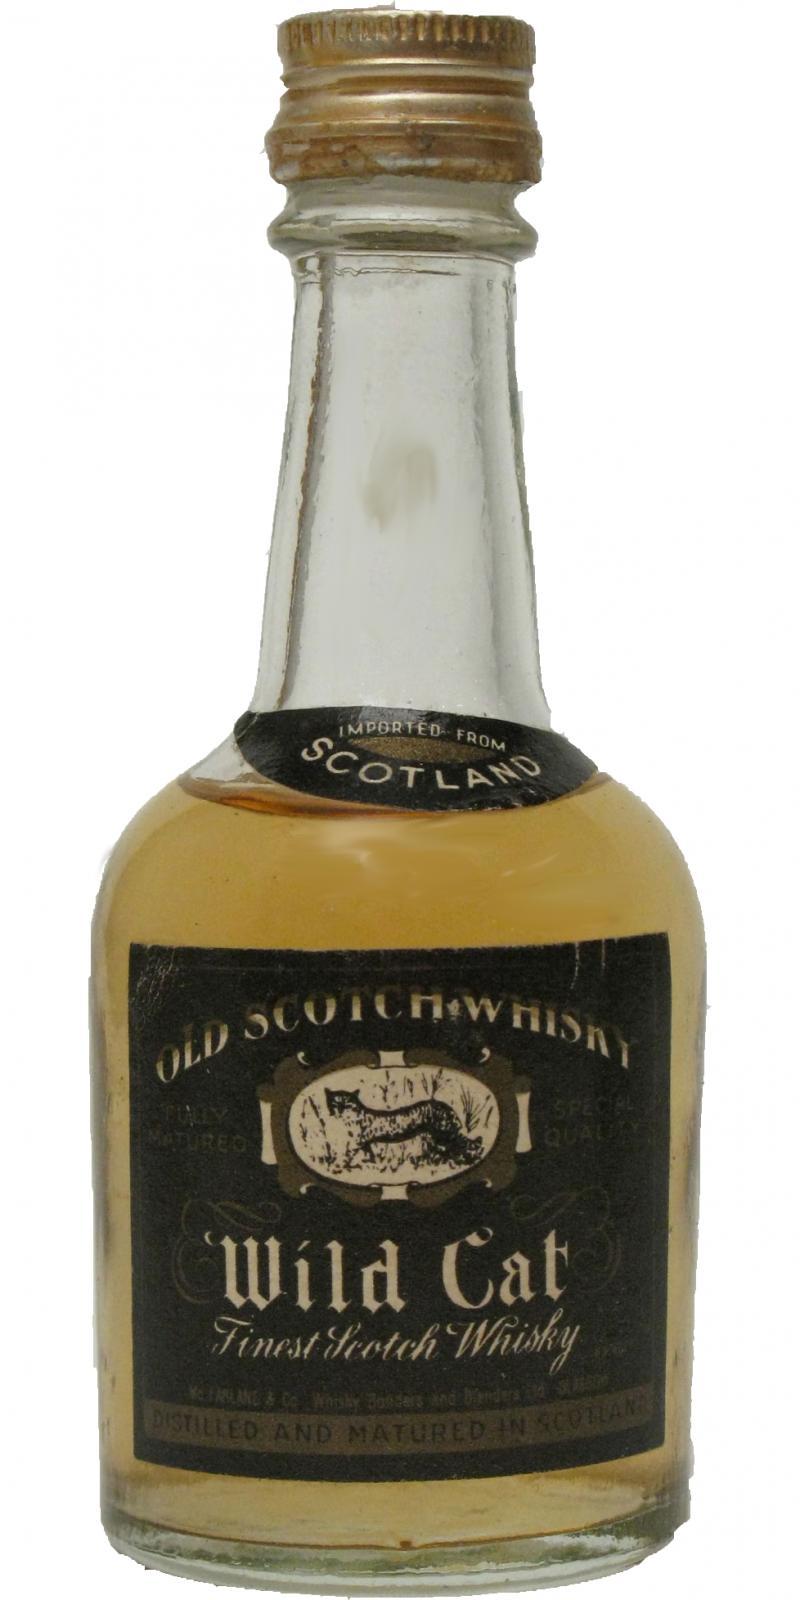 Wild Cat Finest Scotch Whisky